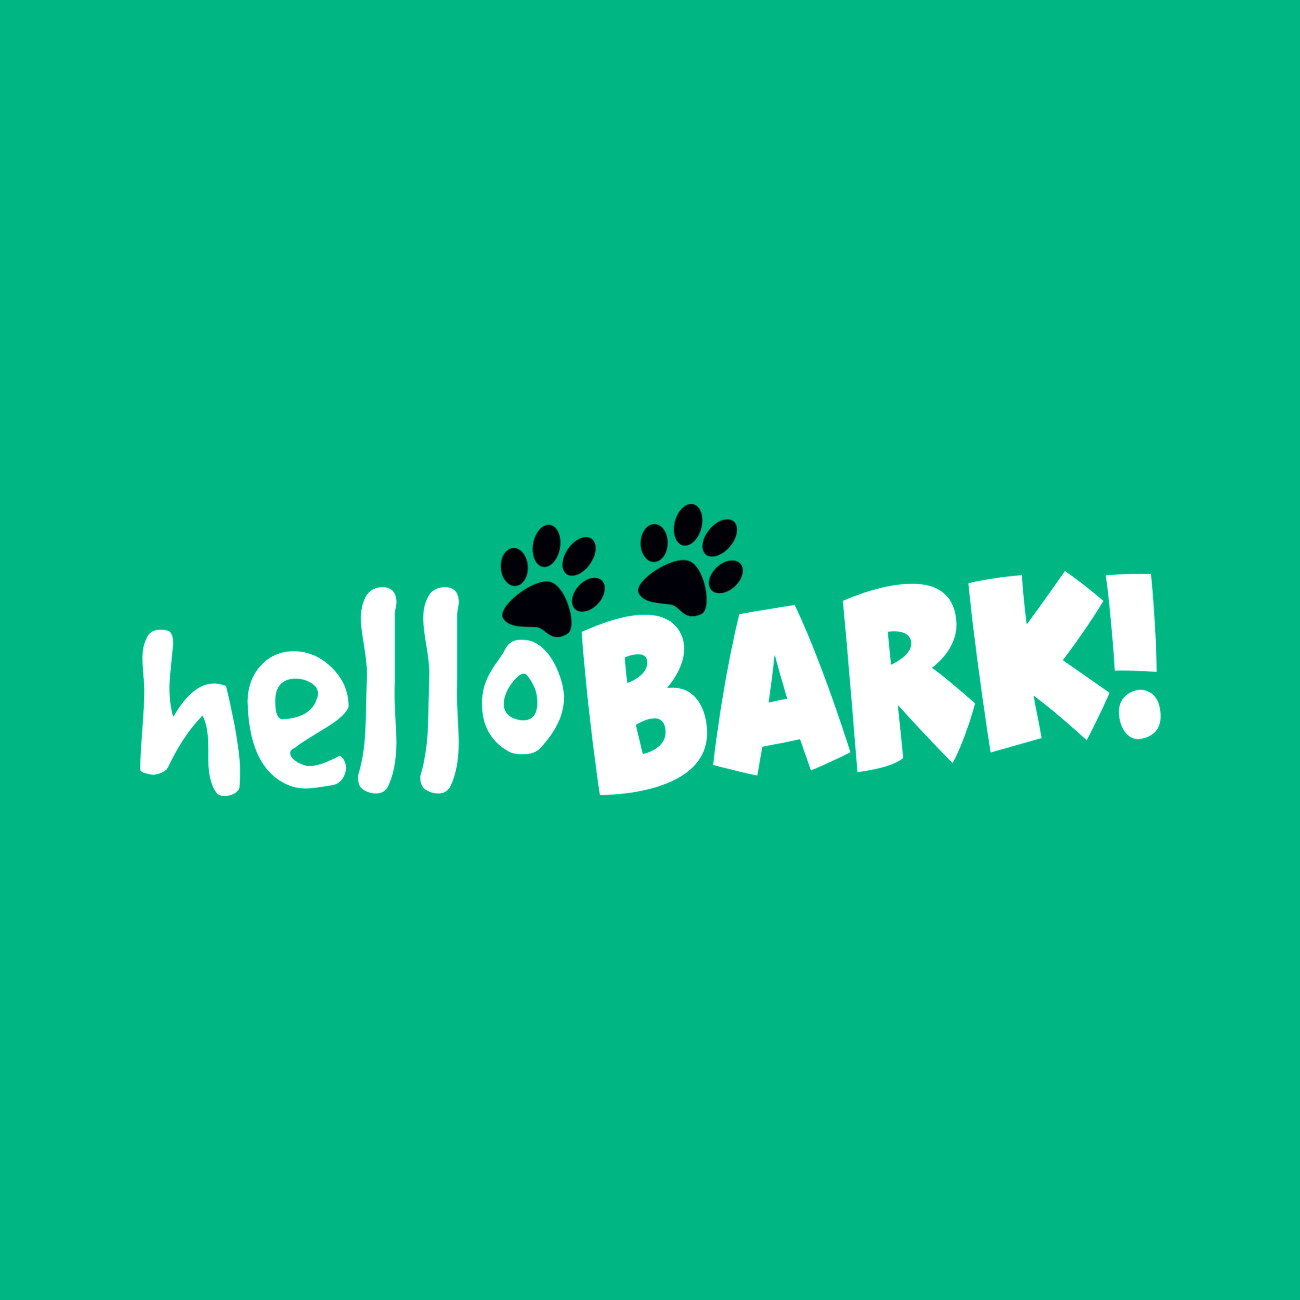 helloBARK!